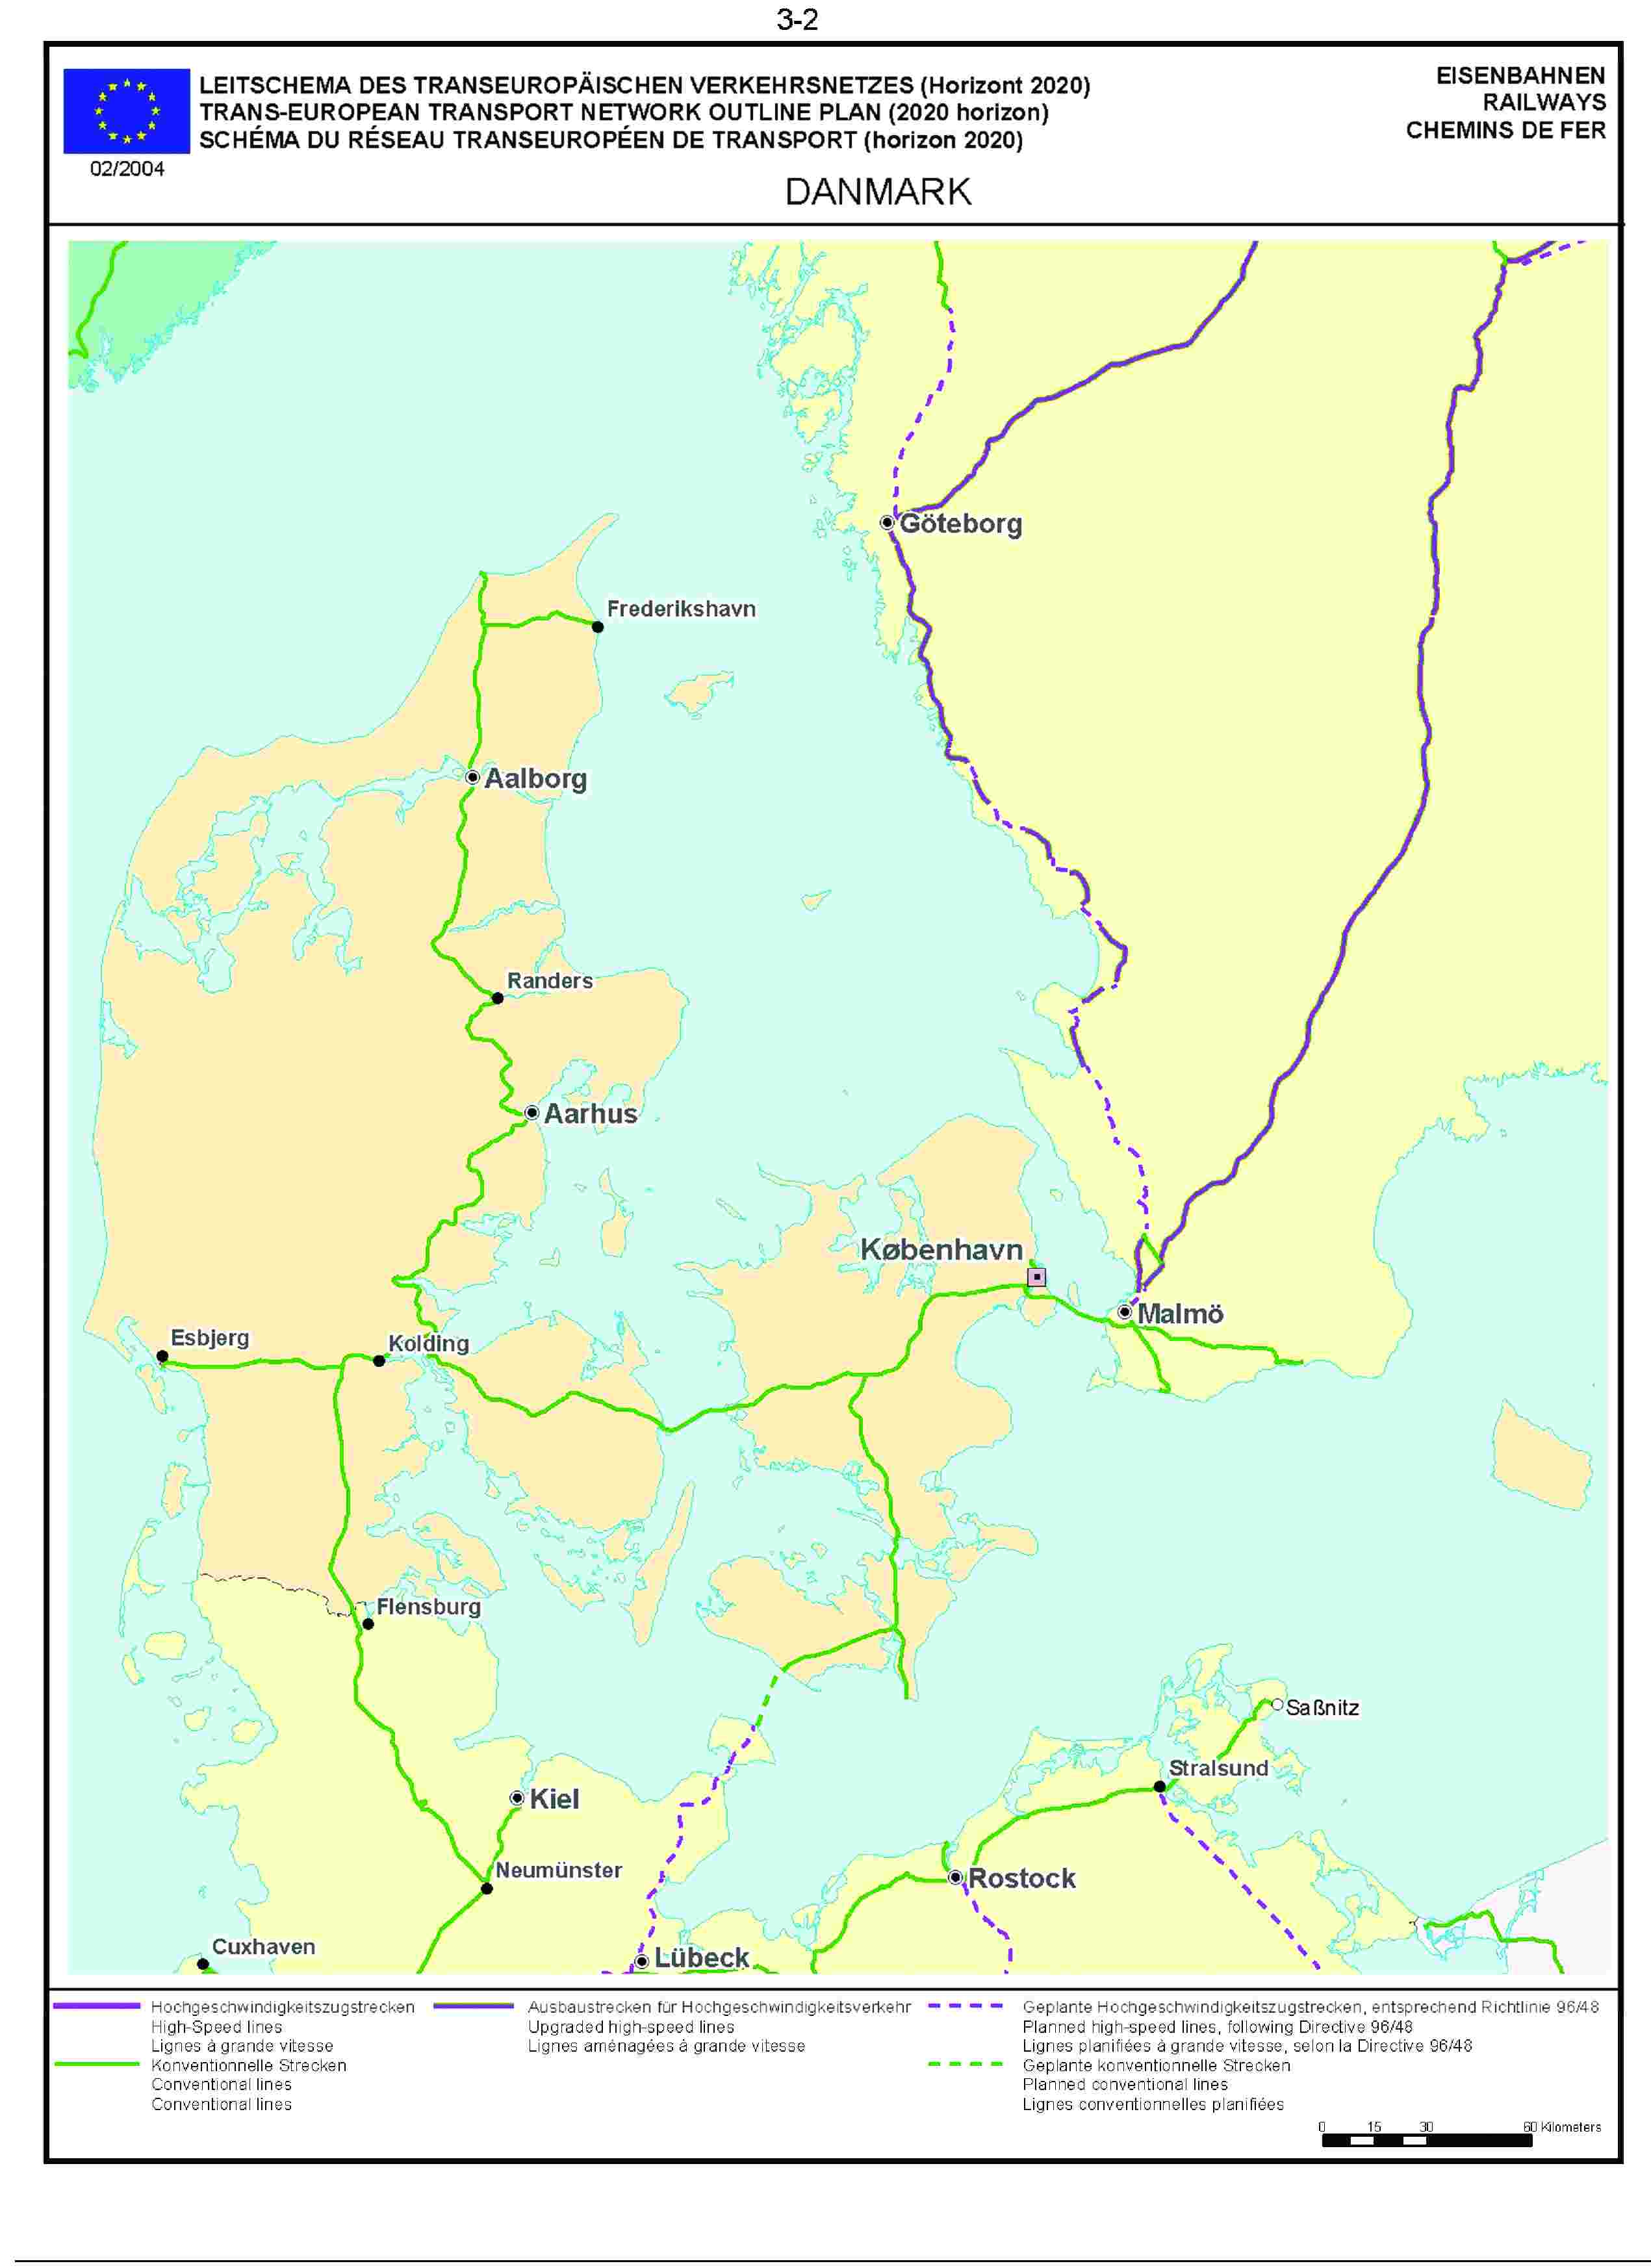 3.2LEITSCHEMA DES TRANSEUROPÄISCHEN VERKEHRSNETZES (Horizont 2020) EISENBAHNENTRANS-EUROPEAN TRANSPORT NETWORK OUTLINE PLAN (2020 horizon) RAILWAYSSCHÉMA DU RÉSEAU TRANSEUROPÉEN DE TRANSPORT (horizon 2020) CHEMINS DE FER02/2004DANMARK